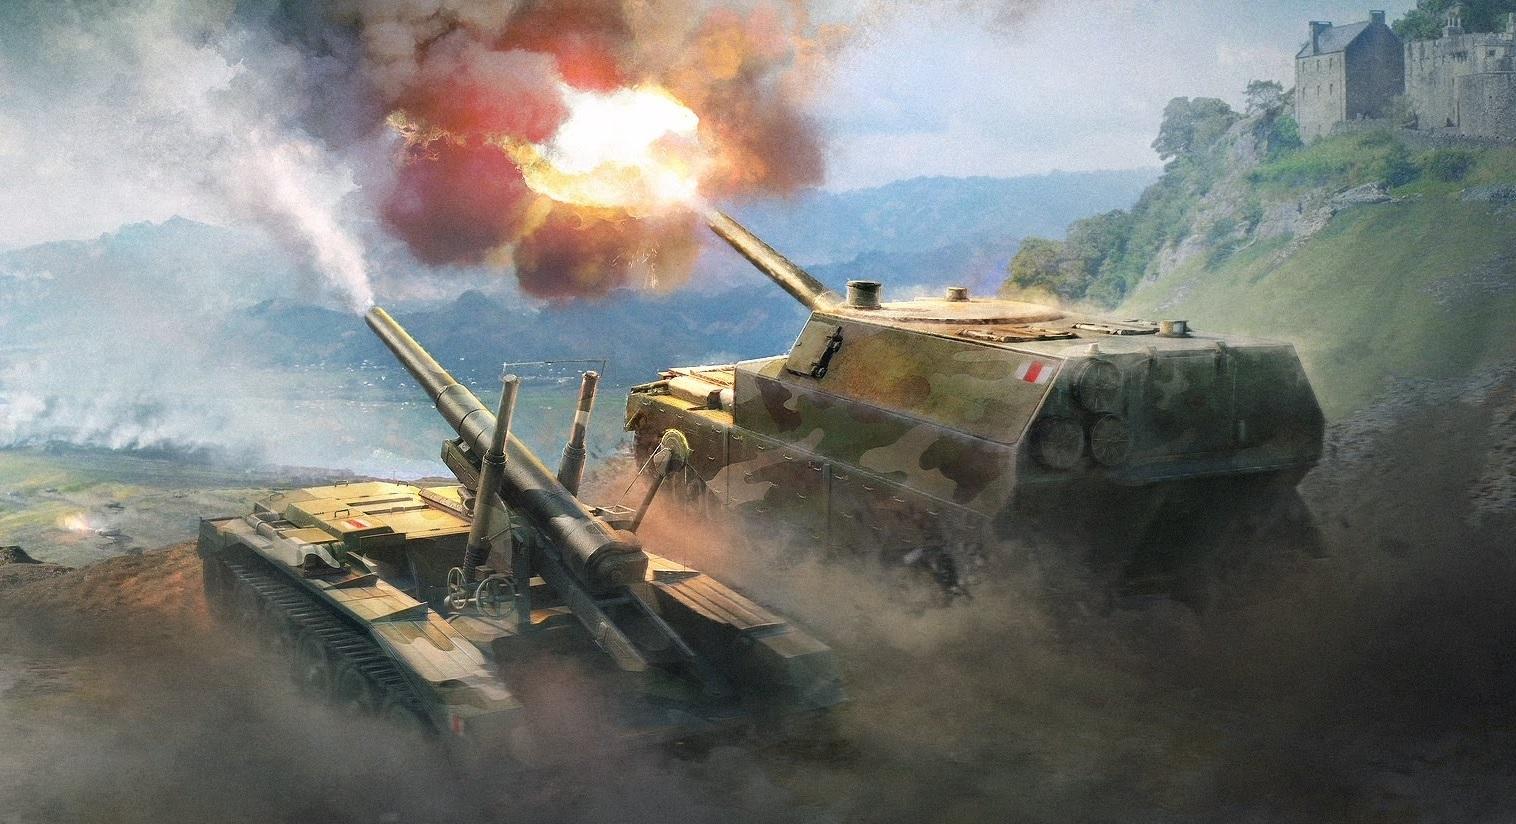 world of tanks ram ii matchmaking